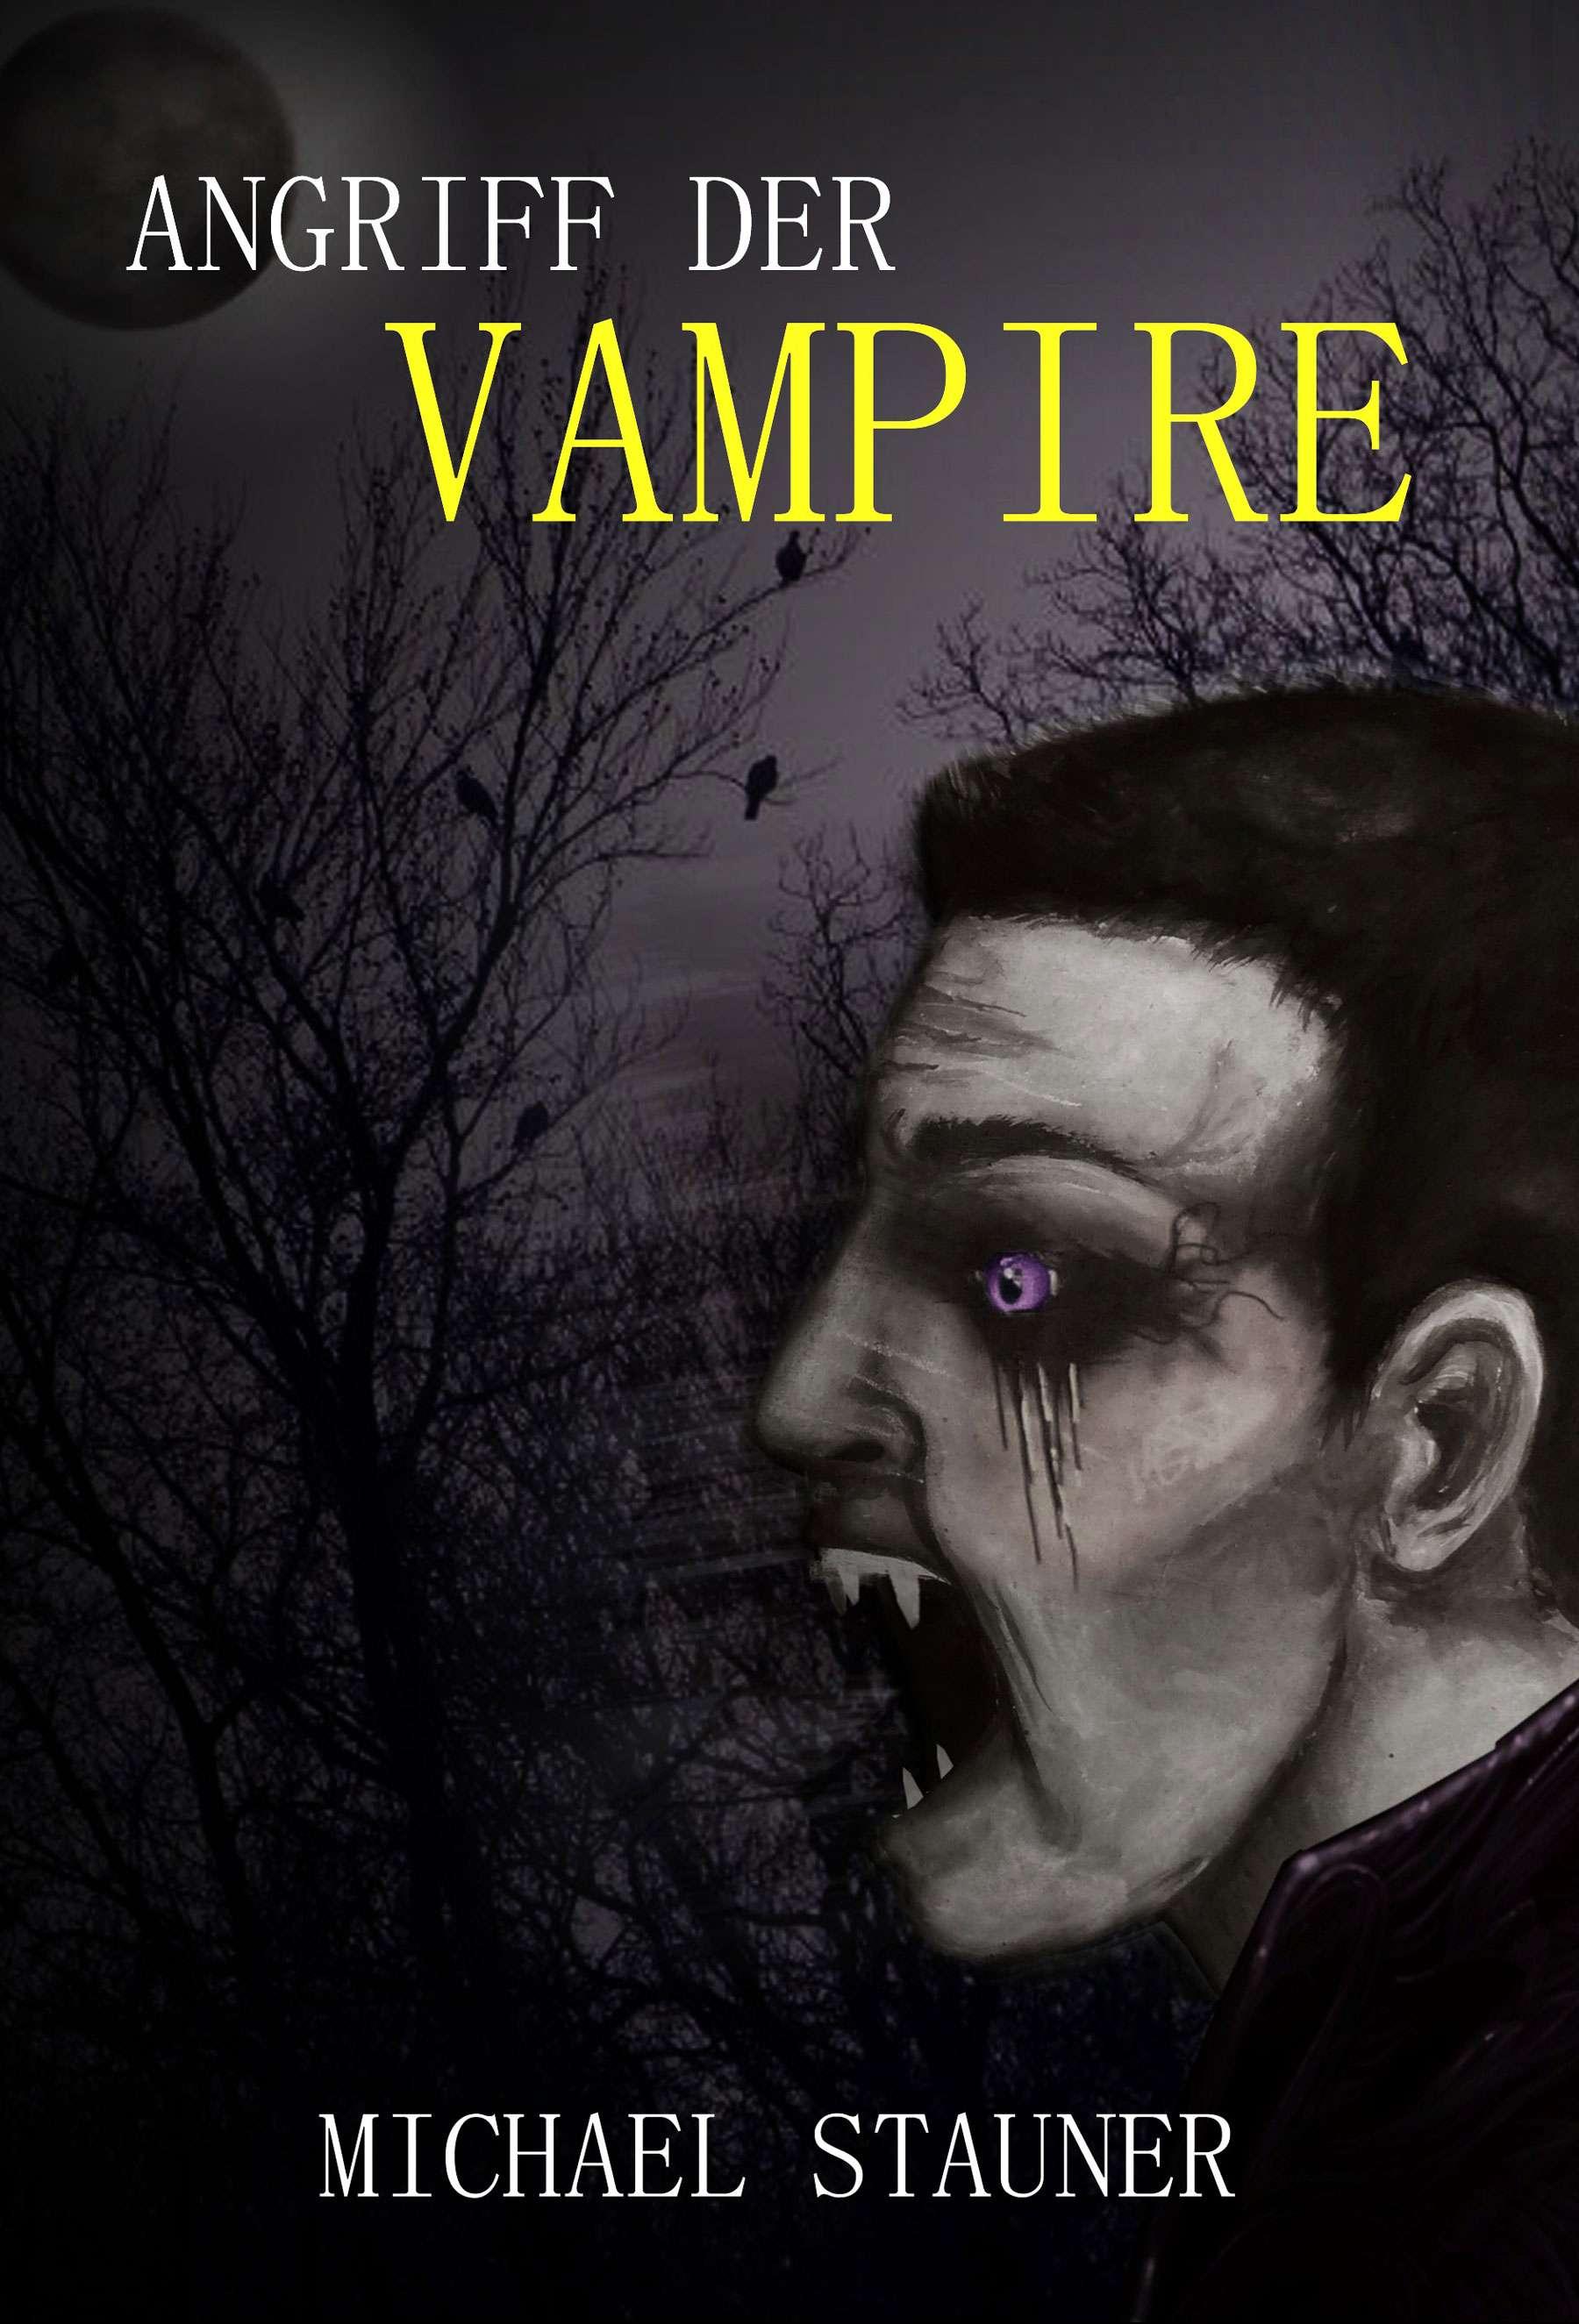 Michael Stauner Angriff der Vampire Book Cover